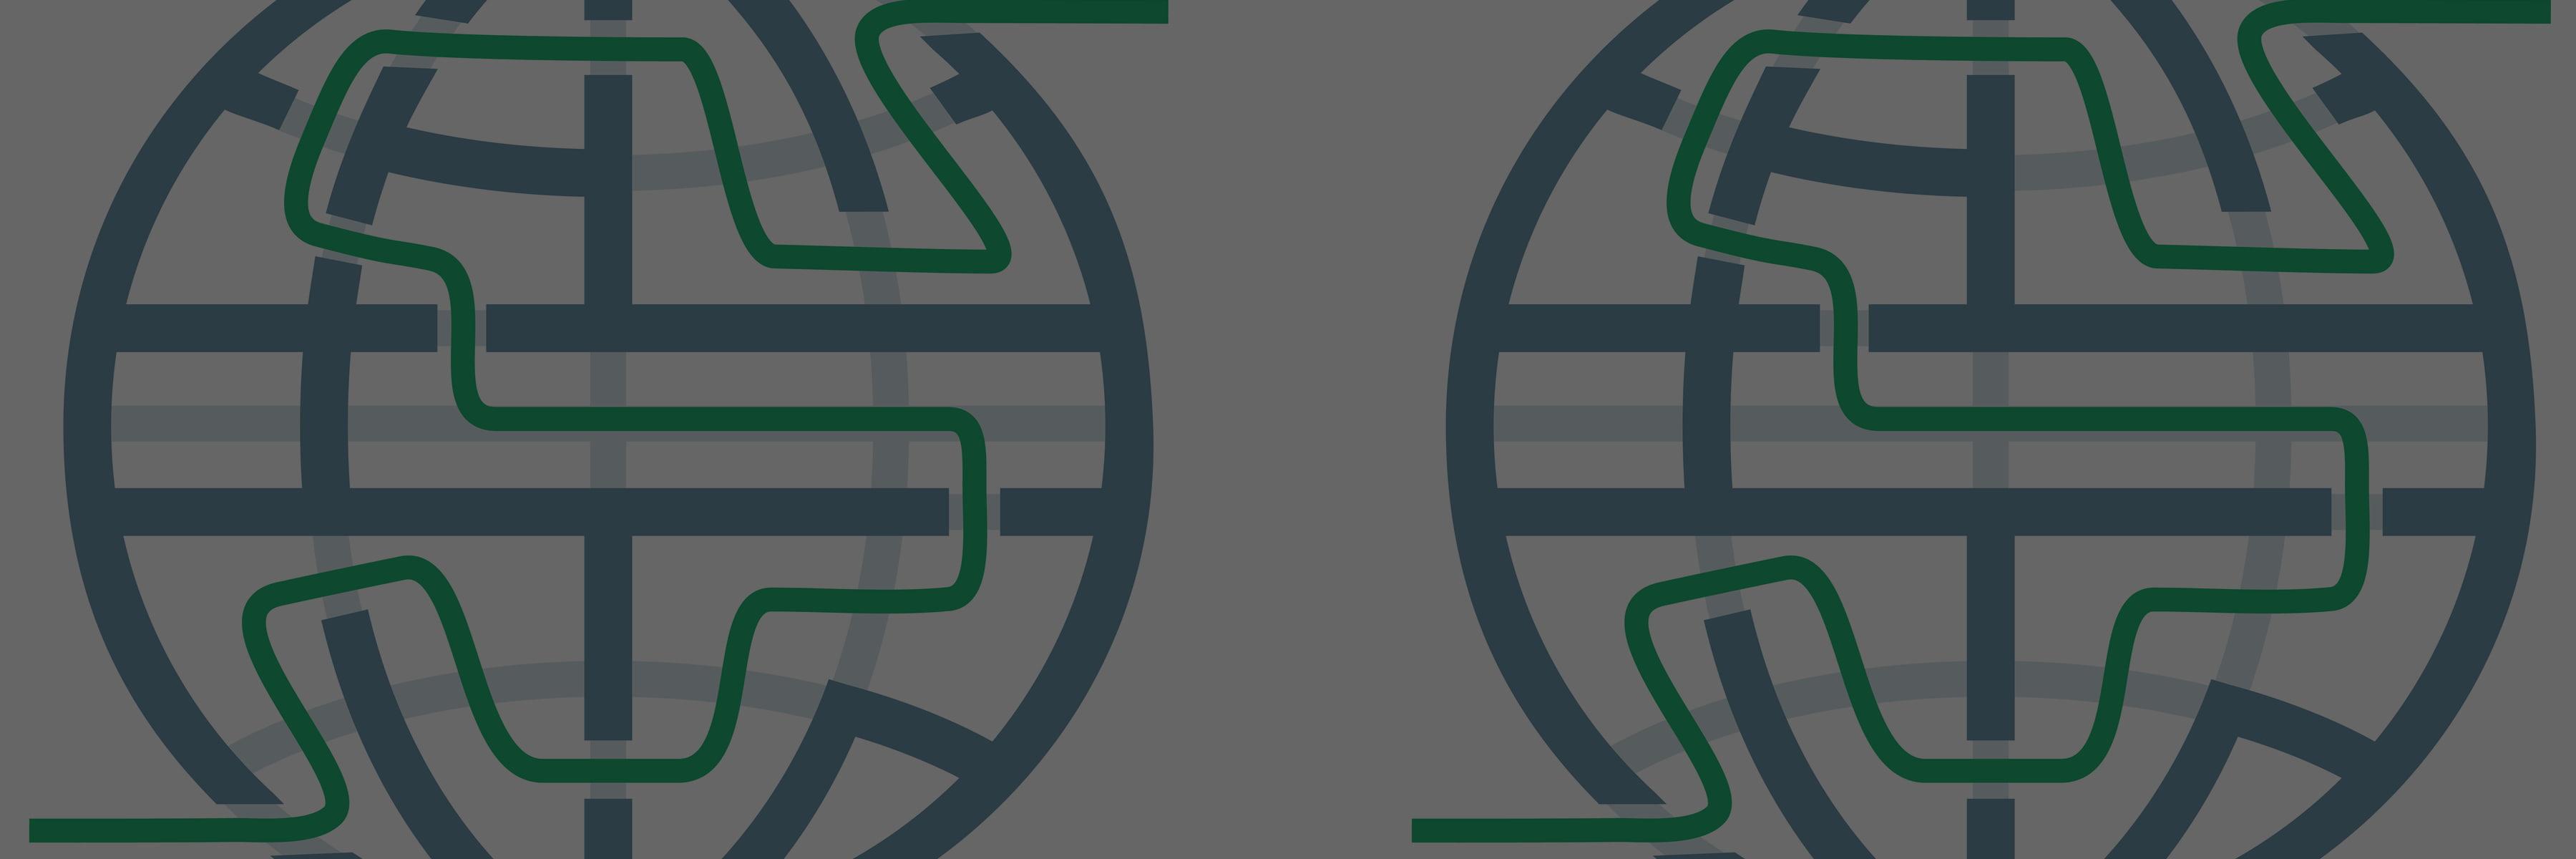 naem-webinar-2016-regulatory-changes-ahead-preparing-for-psm-and-rmp-updates-1800x600-min